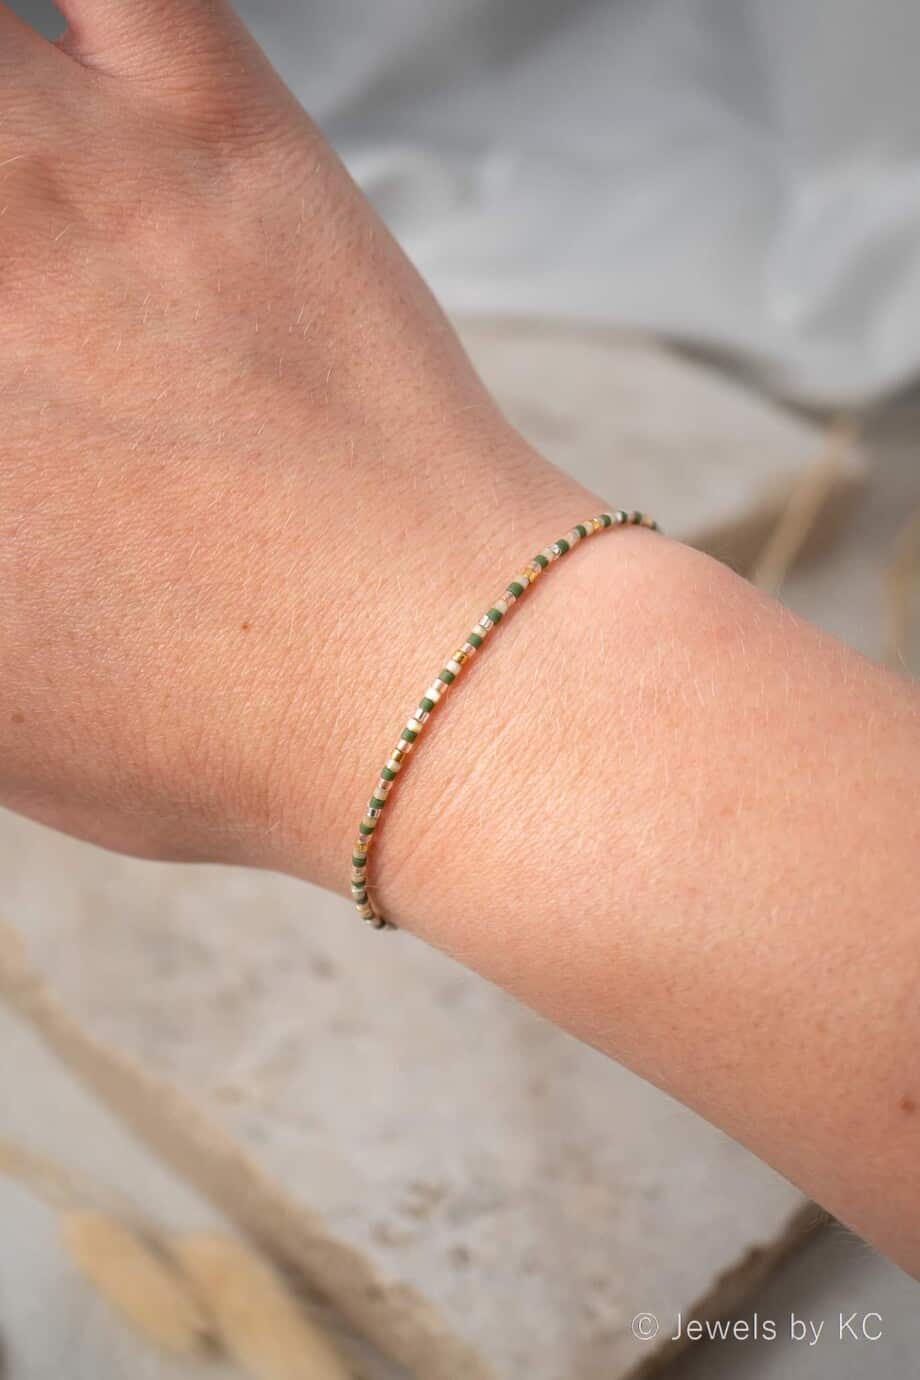 Handgemaakt Miyuki armbandje 'Pastel green & gold' kralen armbandje